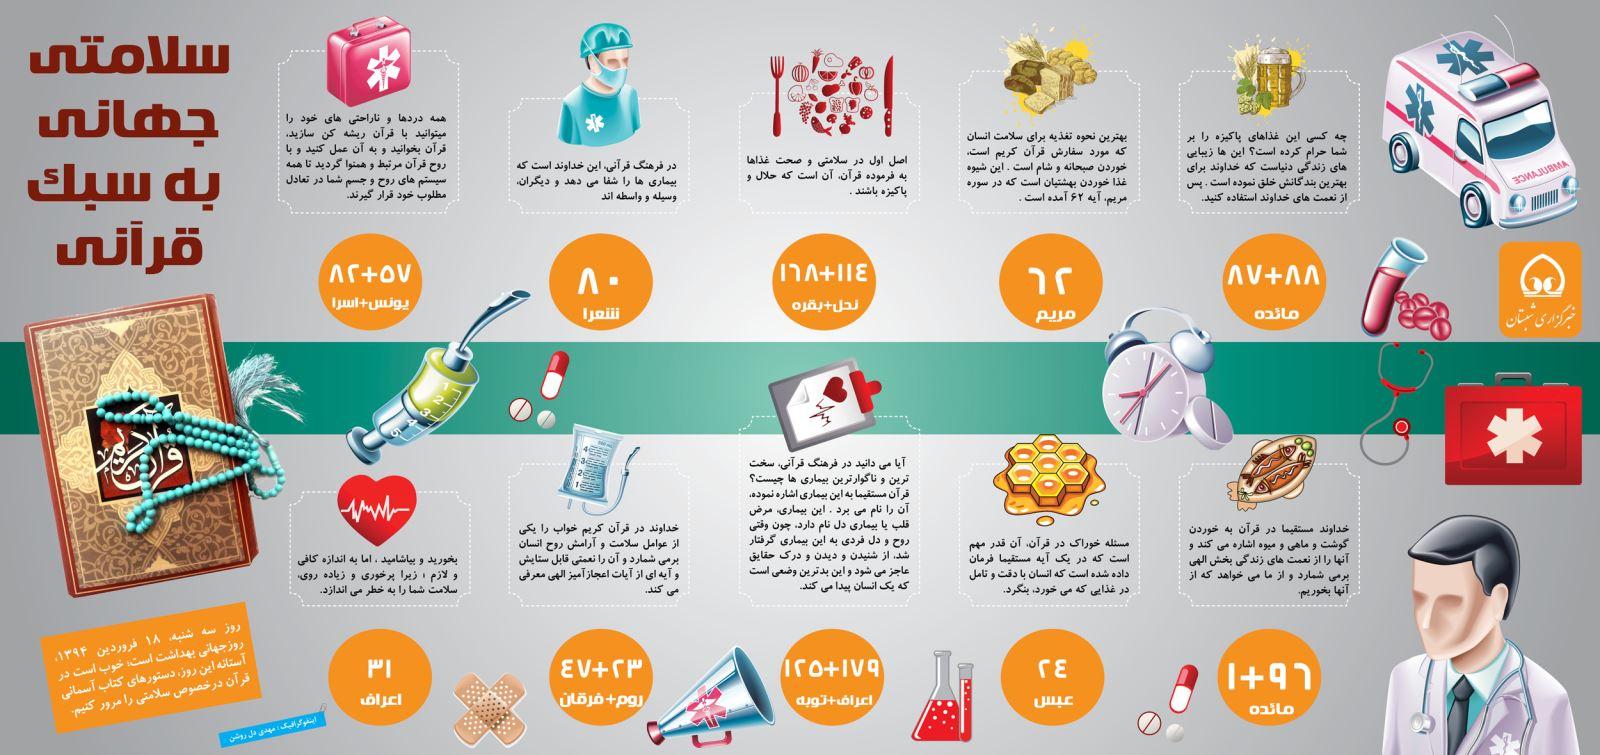 Quran-shabes.jpg